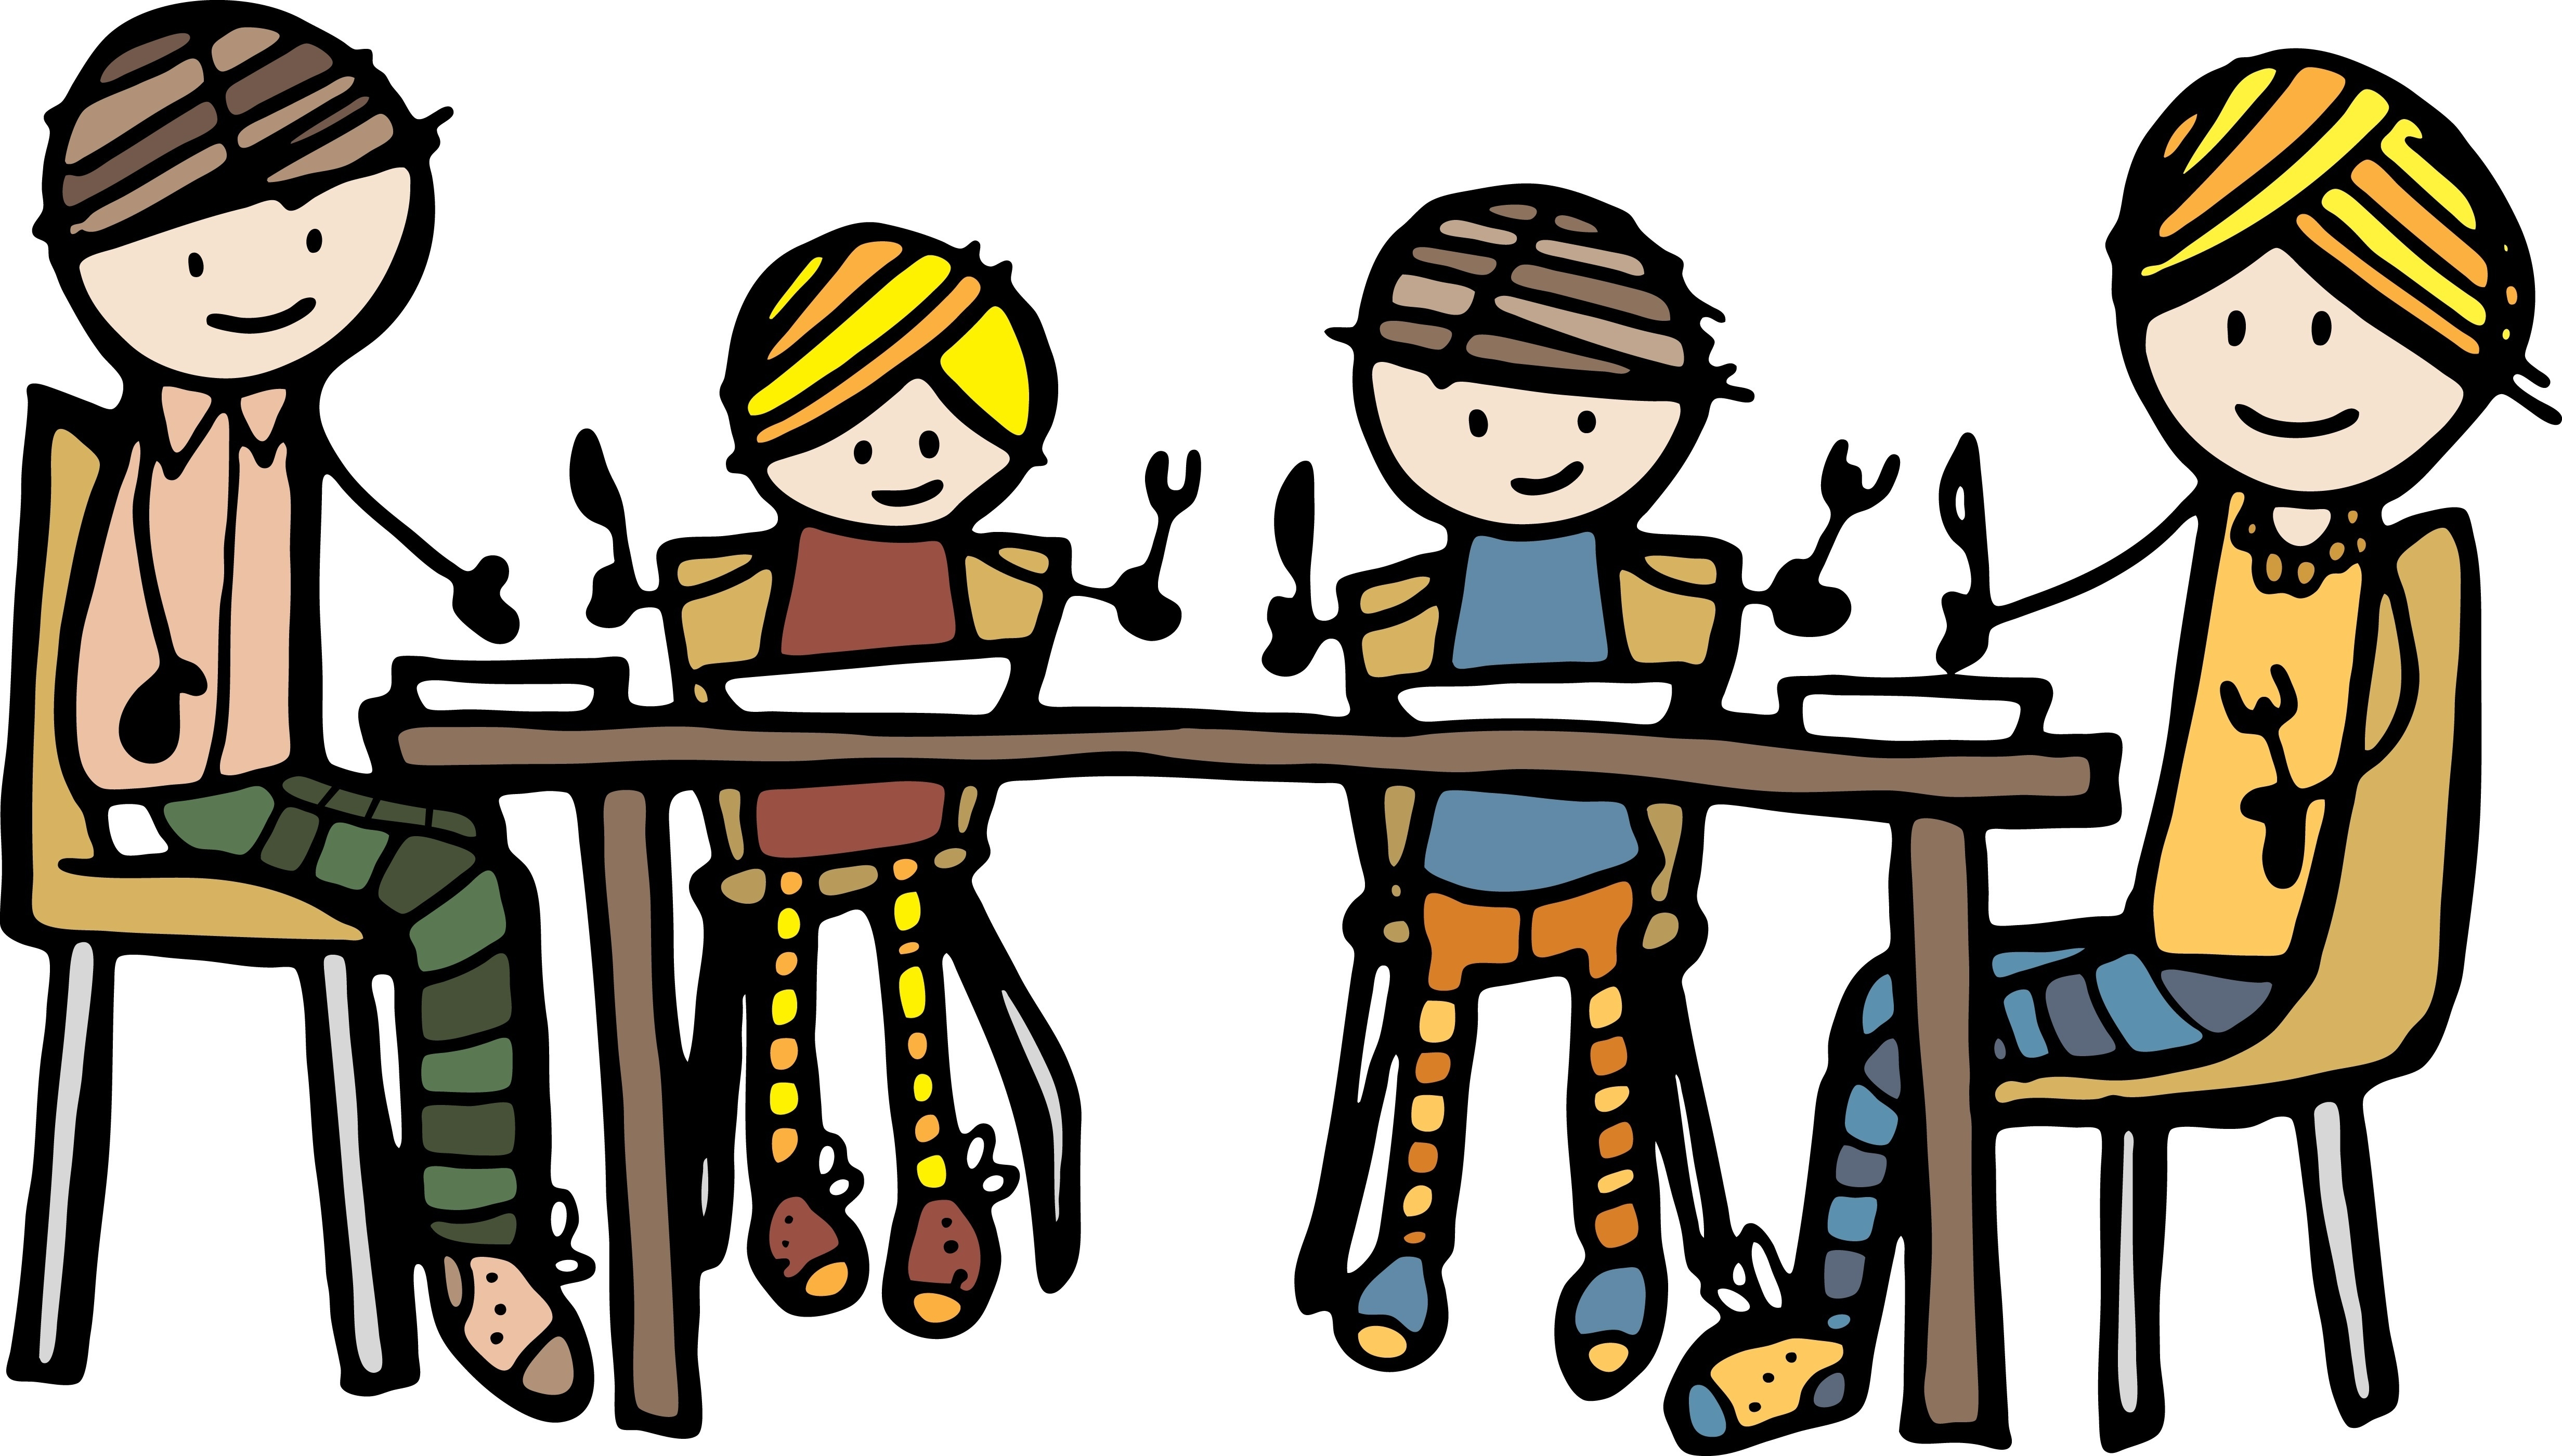 Family Eating Dinner Together .-Family Eating Dinner Together .-9